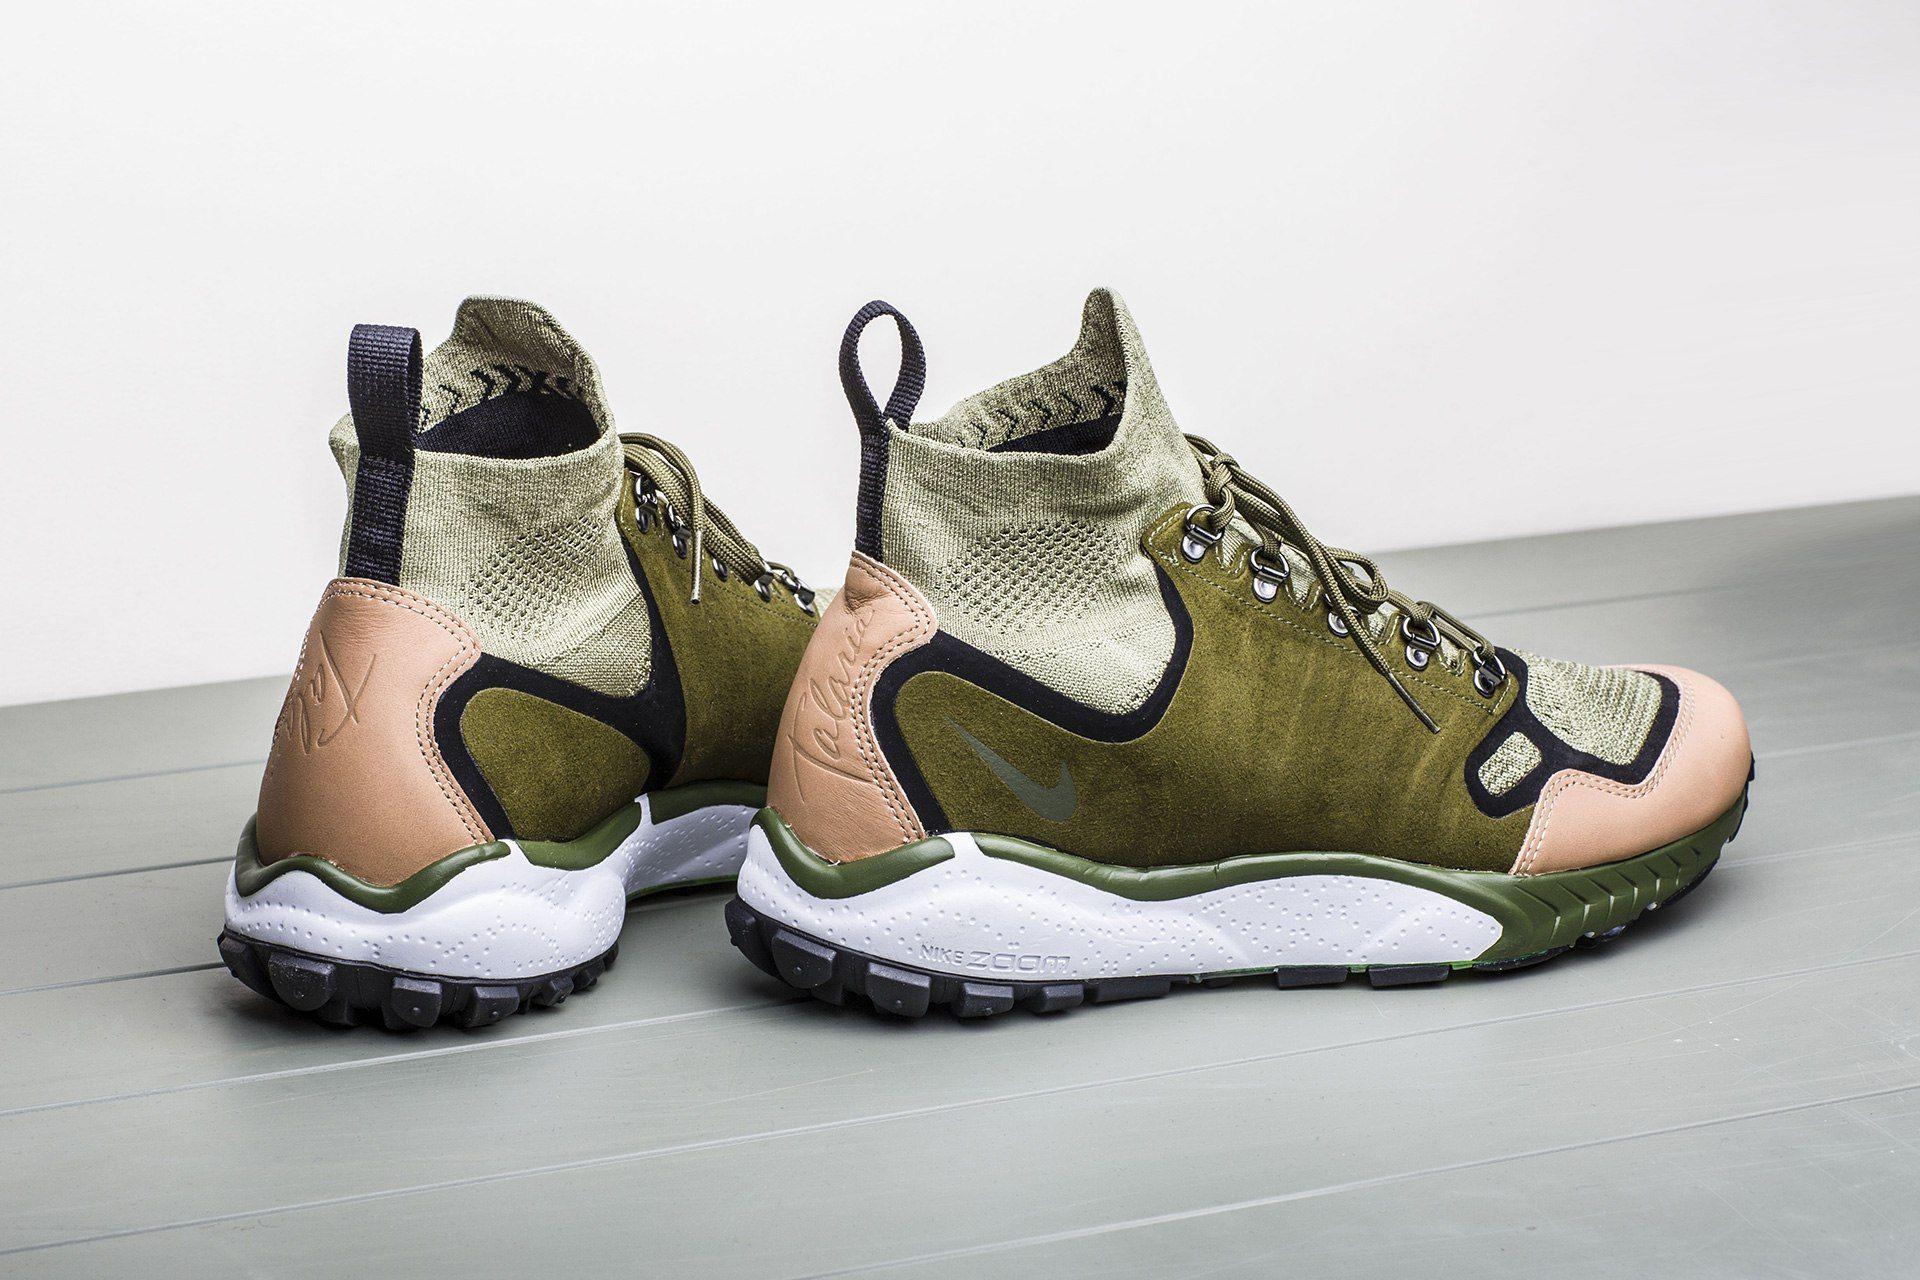 0f3MPBQUs9M.jpg (1920×1280) · Green ShoesNike ShoesWomen's ShoesLadies ...